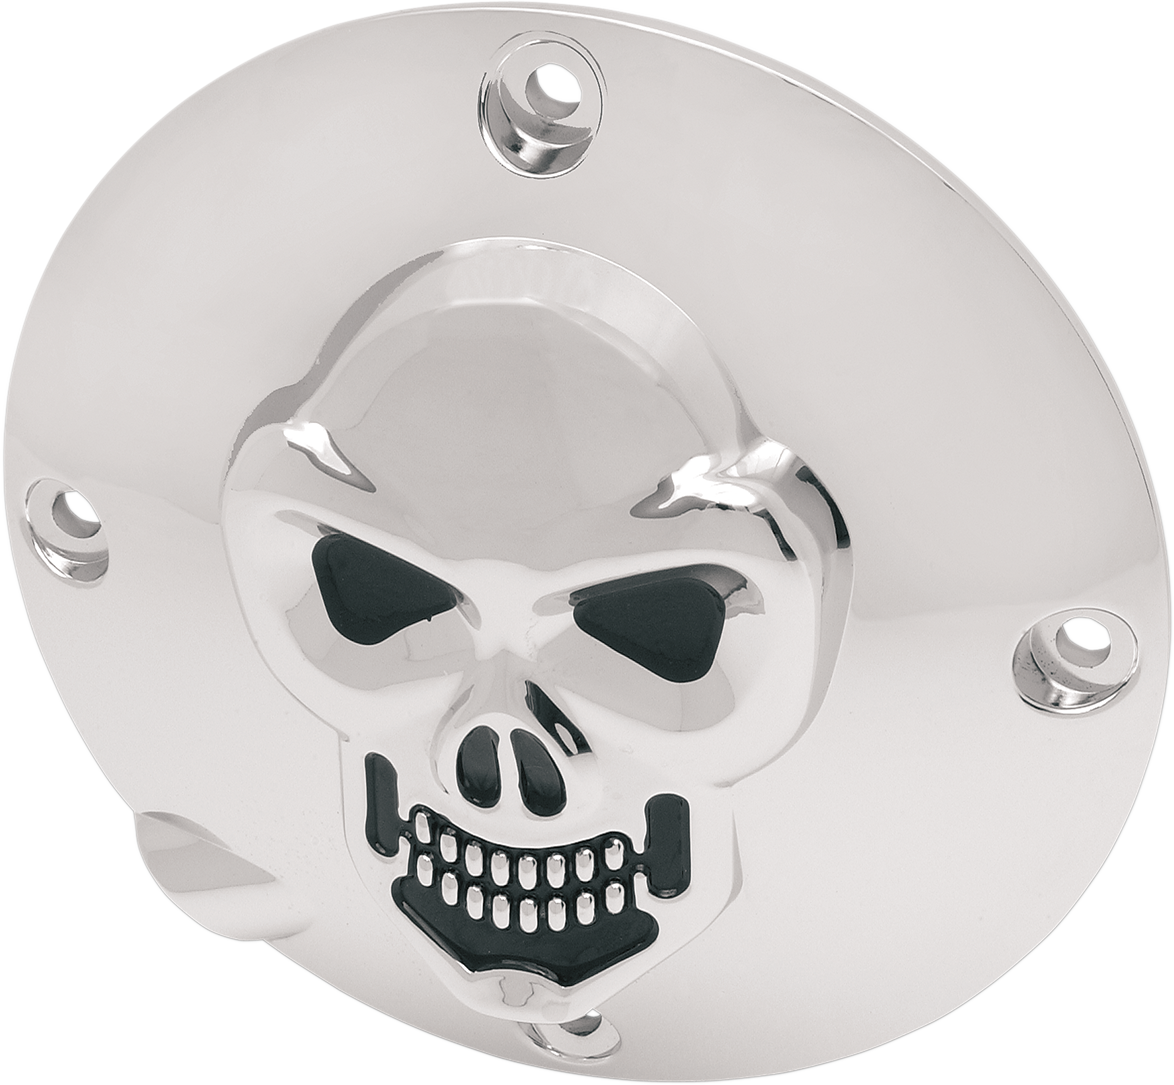 Drag Specialties 3-D Chrome Skull Derby Cover for 1994-2003 Harley Sportster